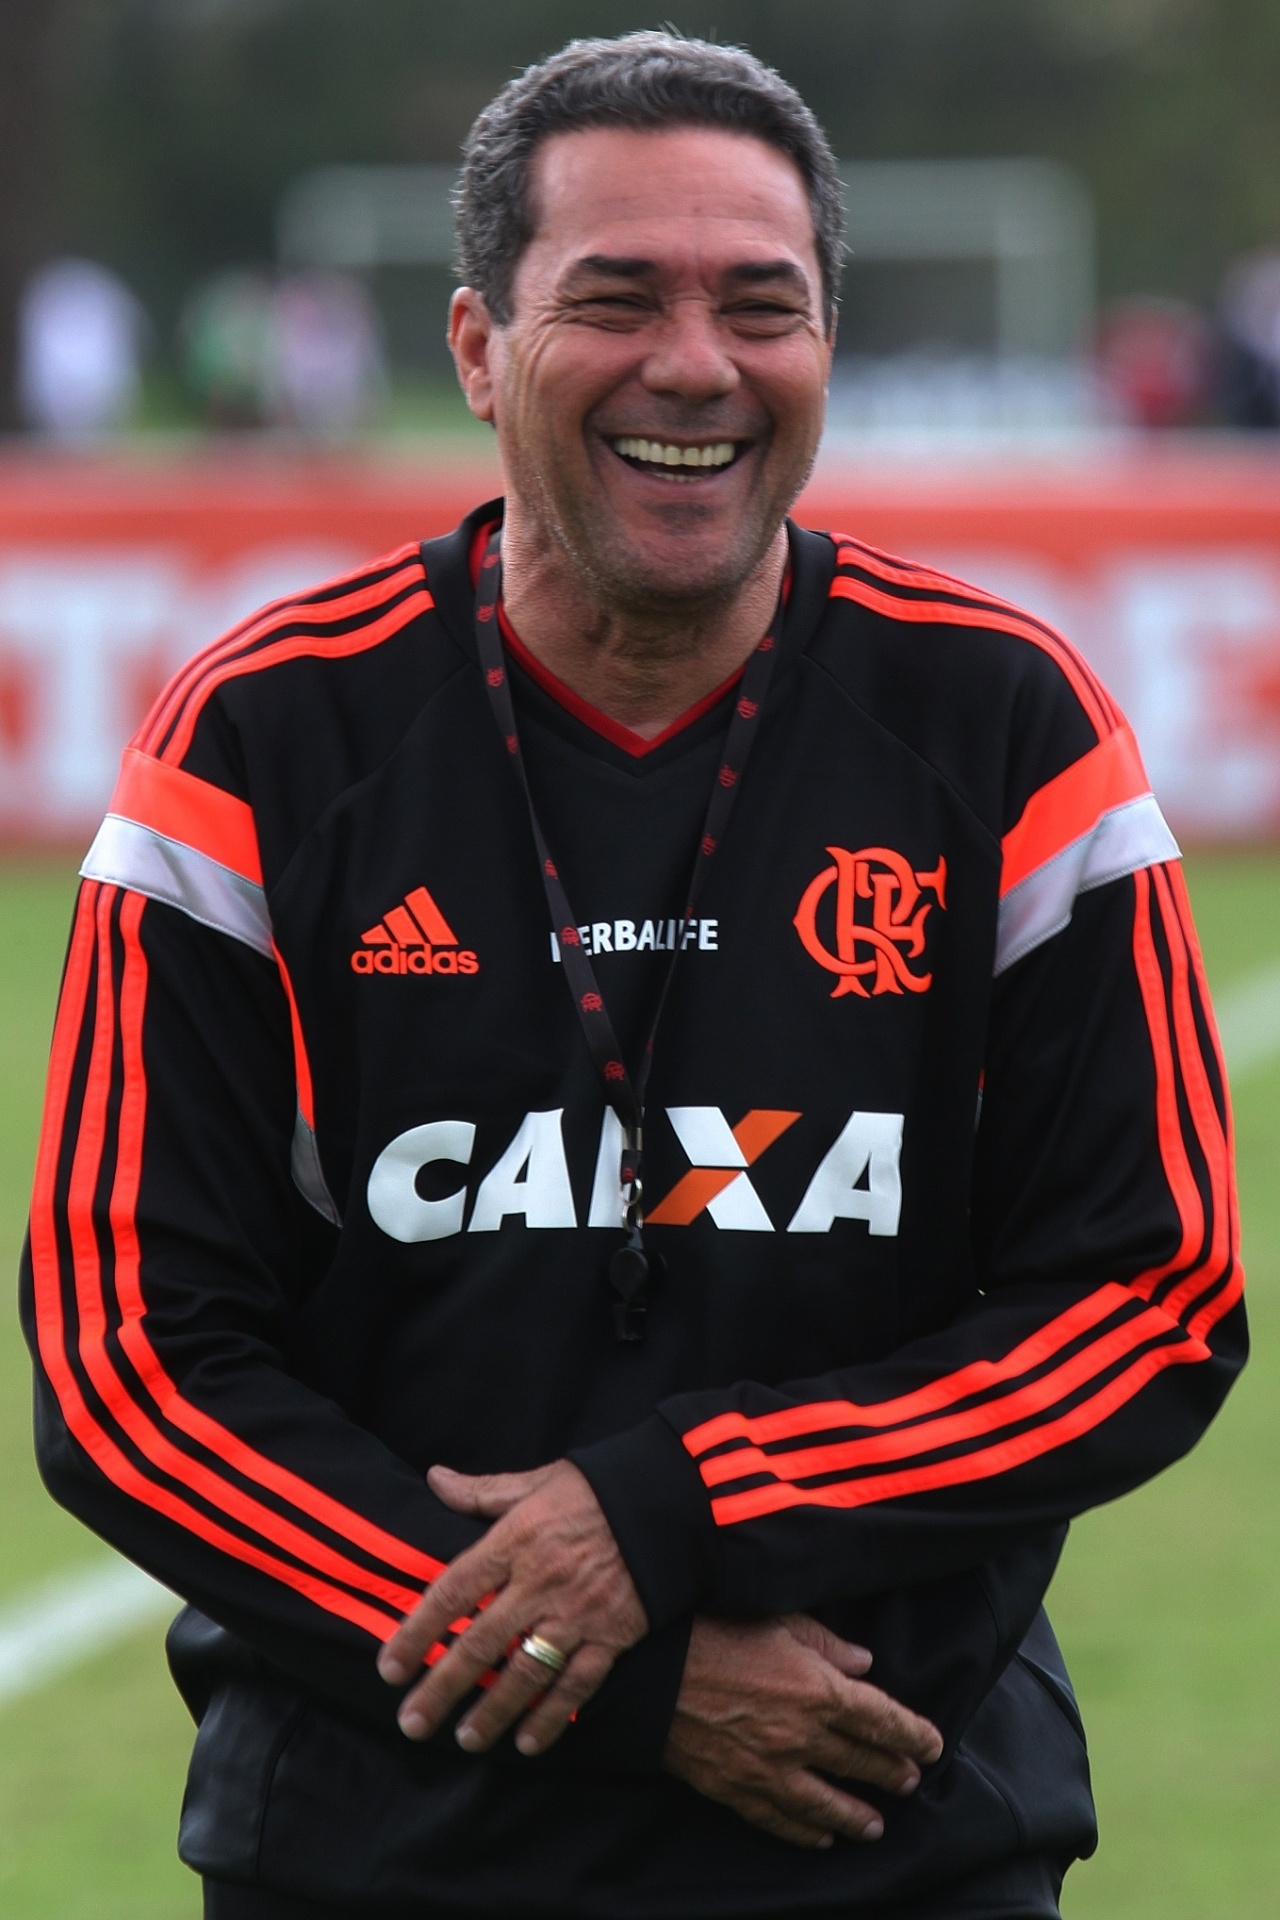 Vanderlei Luxemburgo sorri durante treinamento do Flamengo no CT Ninho do Urubu